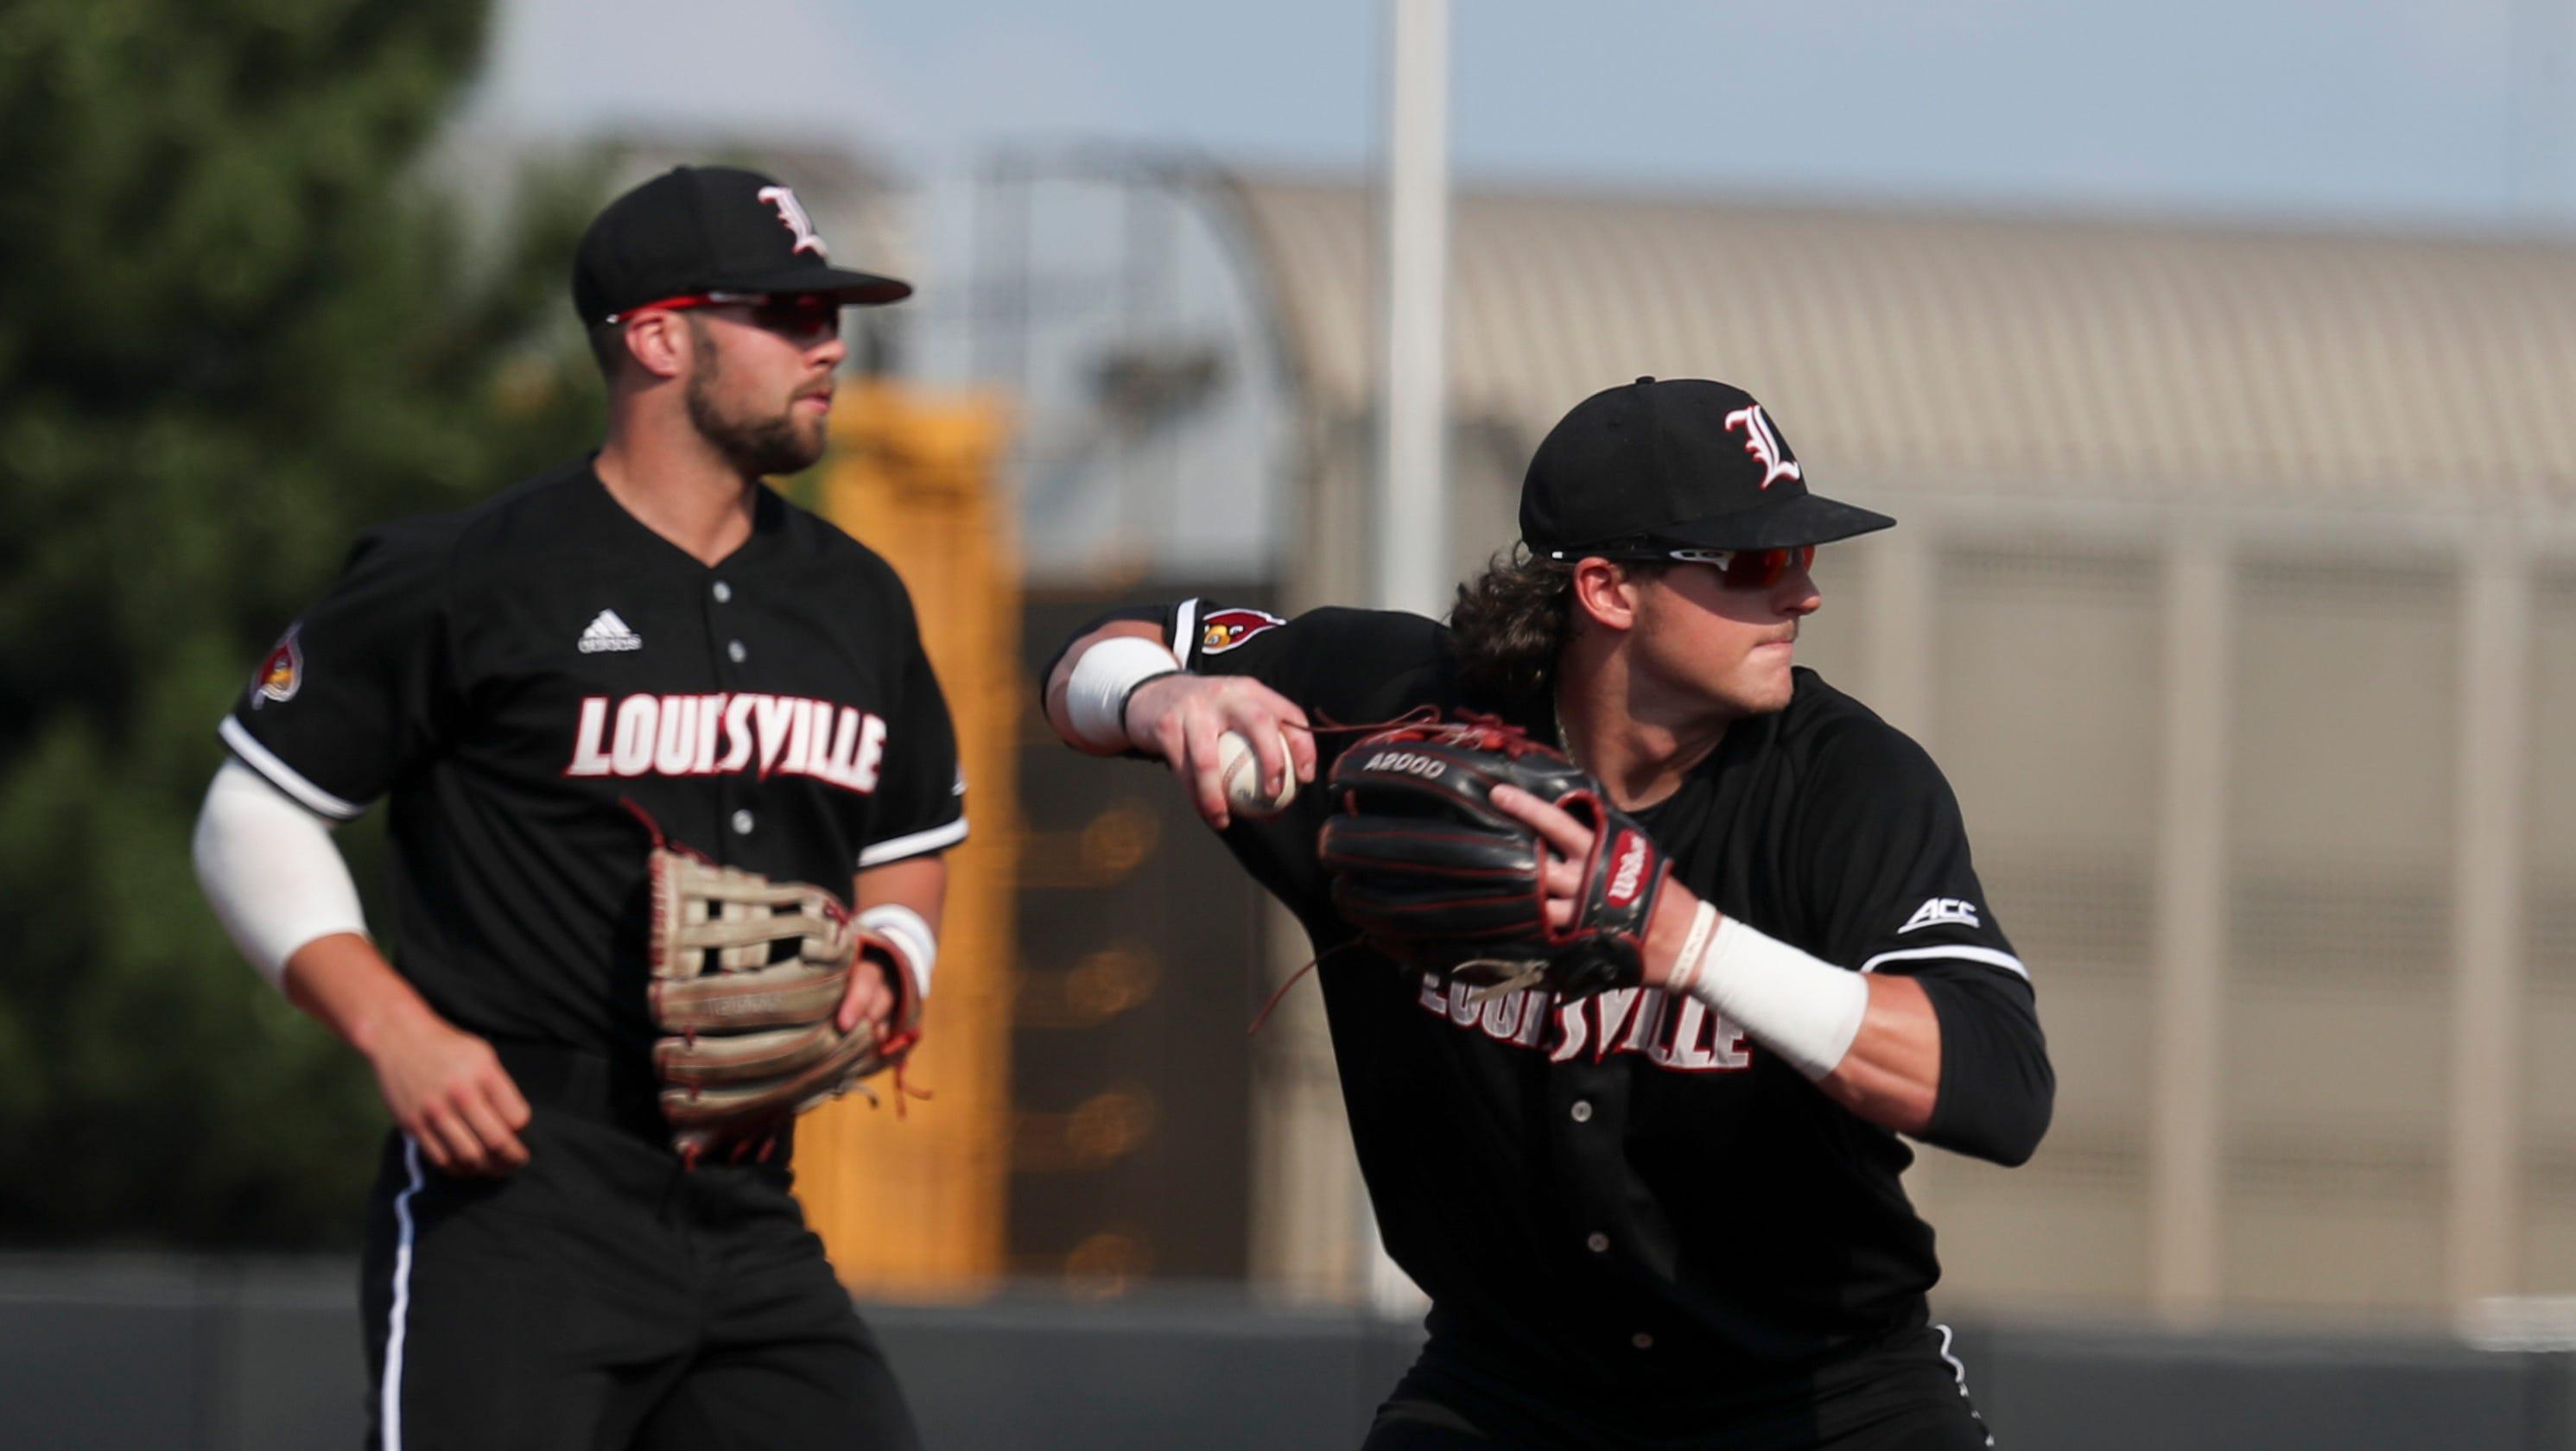 san francisco 3794d 6ade1 Louisville baseball upset by Illinois State, will play Indiana on Sunday